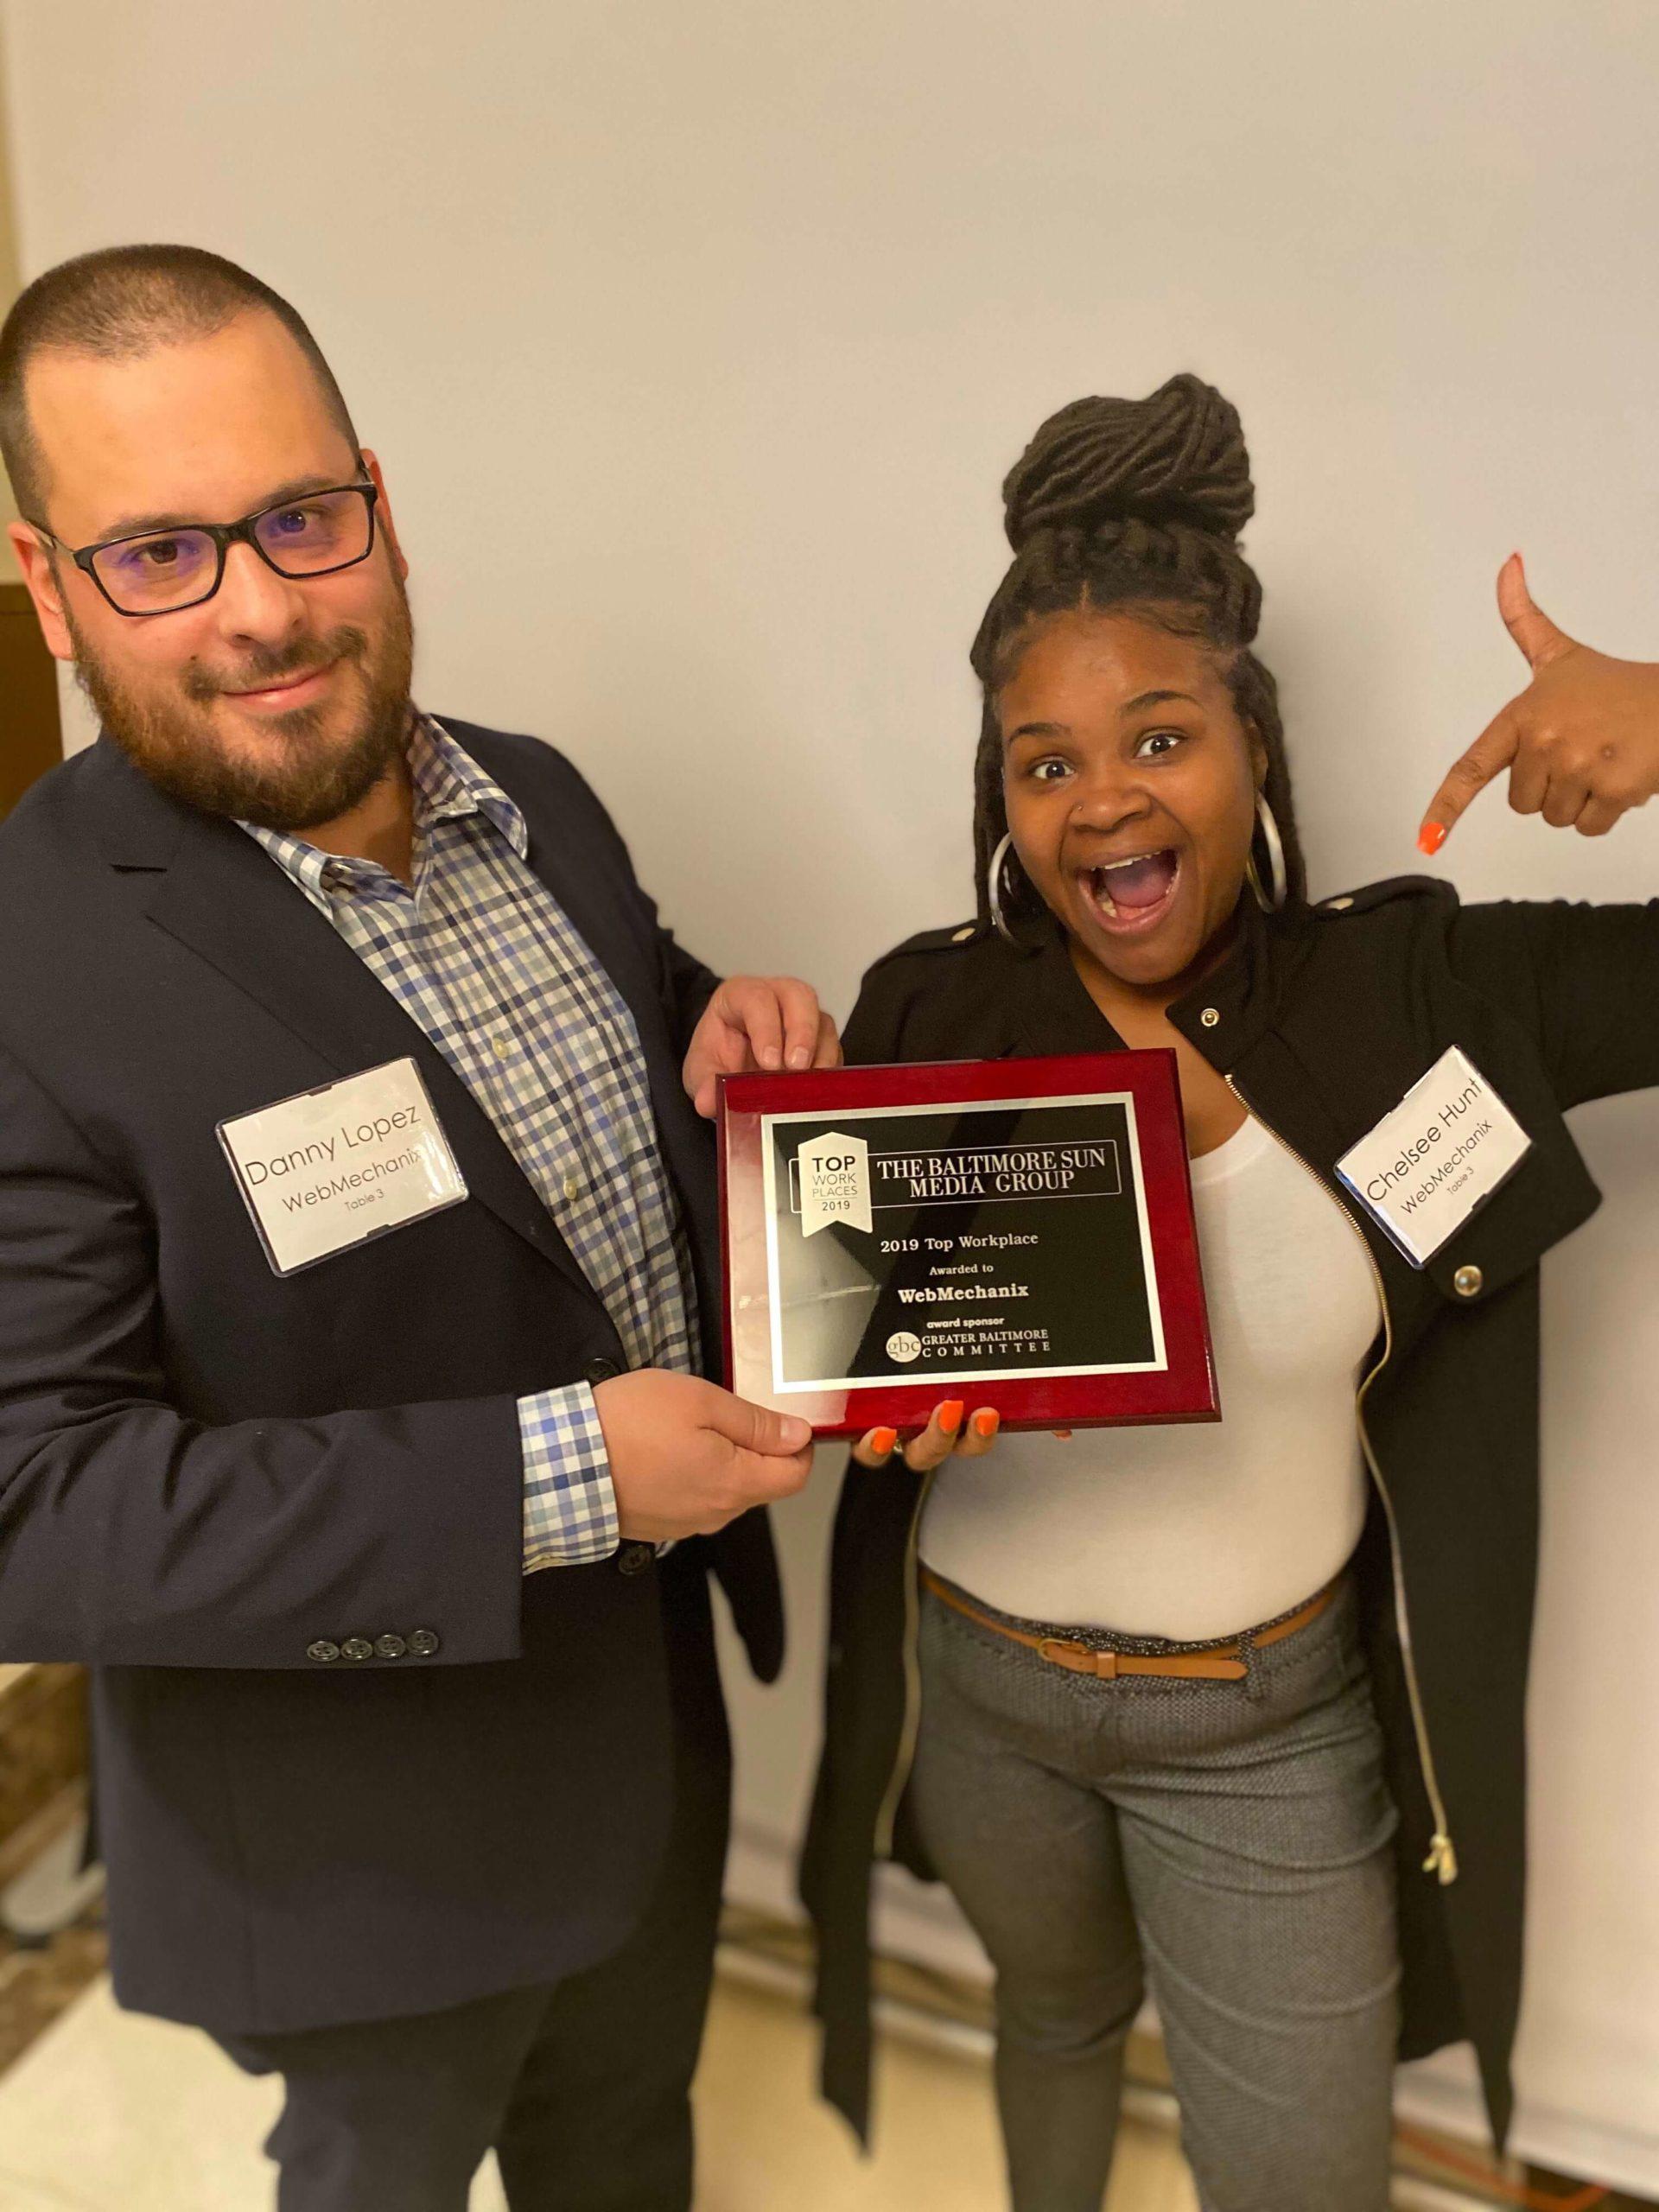 Baltimore Sun Gives the Top Workplace Award to WebMechanix 2019